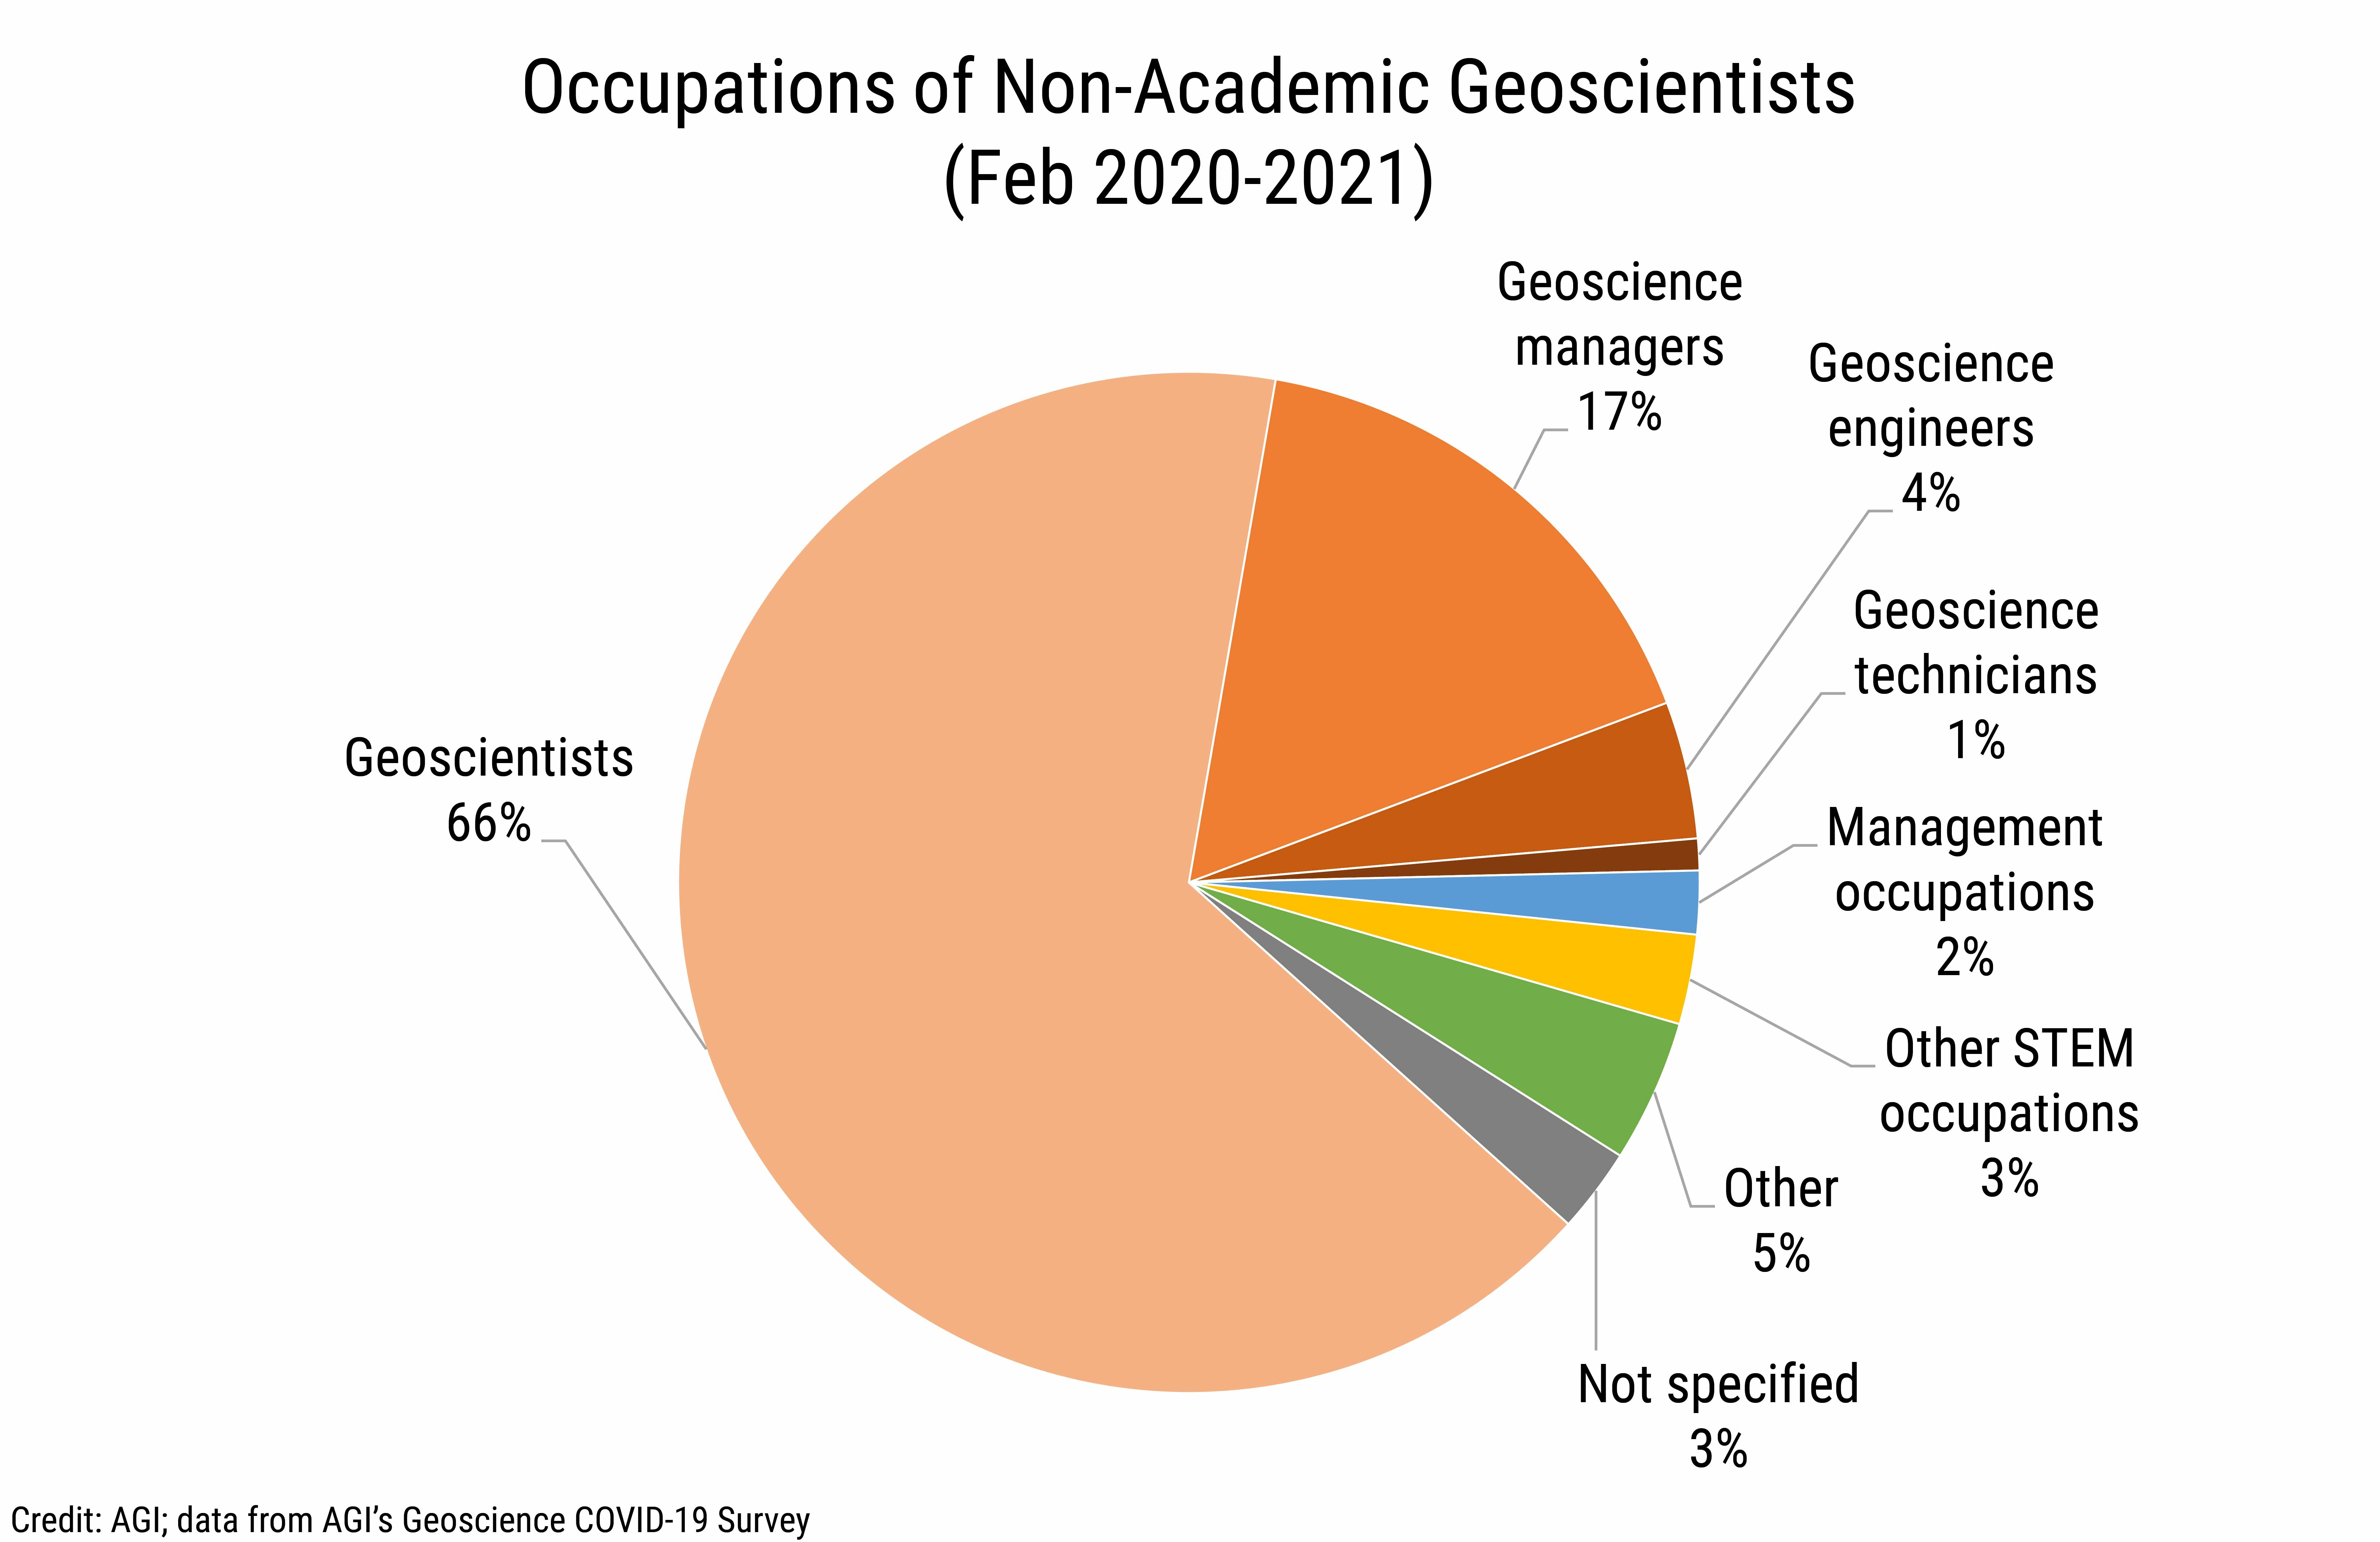 DB_2021-006 chart 03: Occupations of non-academic geoscientists (Credit: AGI; data from AGI's Geoscience COVID-19 Survey)